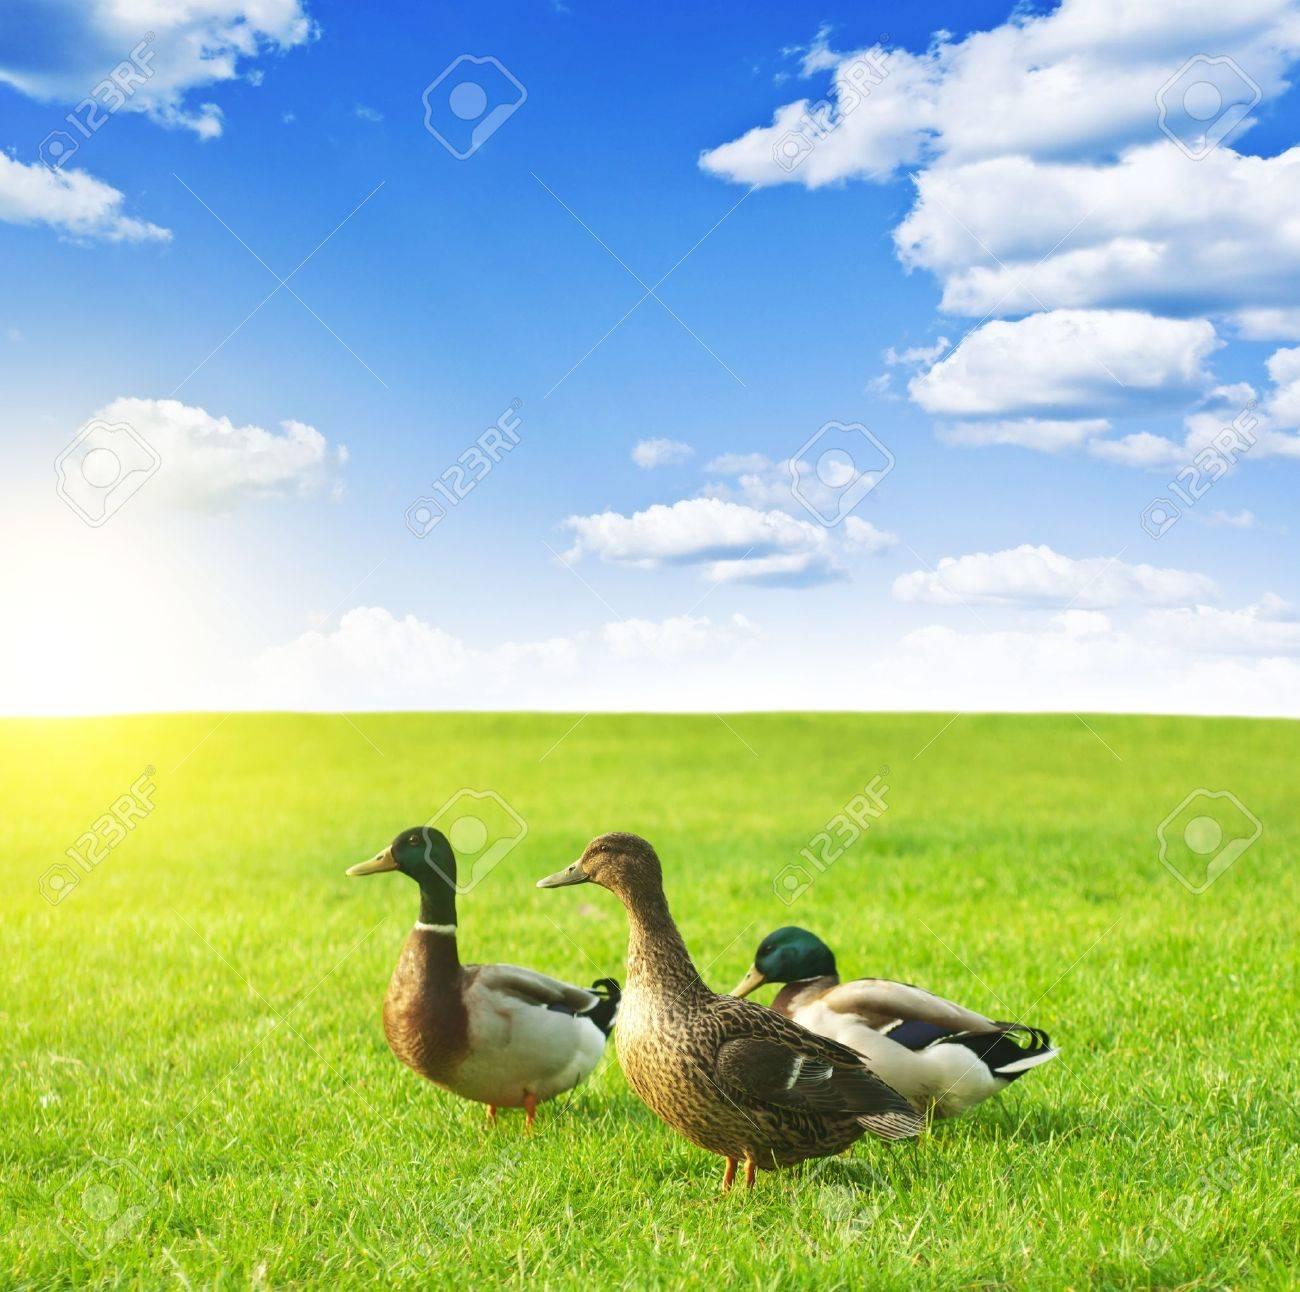 ducks on a green meadow under a cloudy sky - 16307644